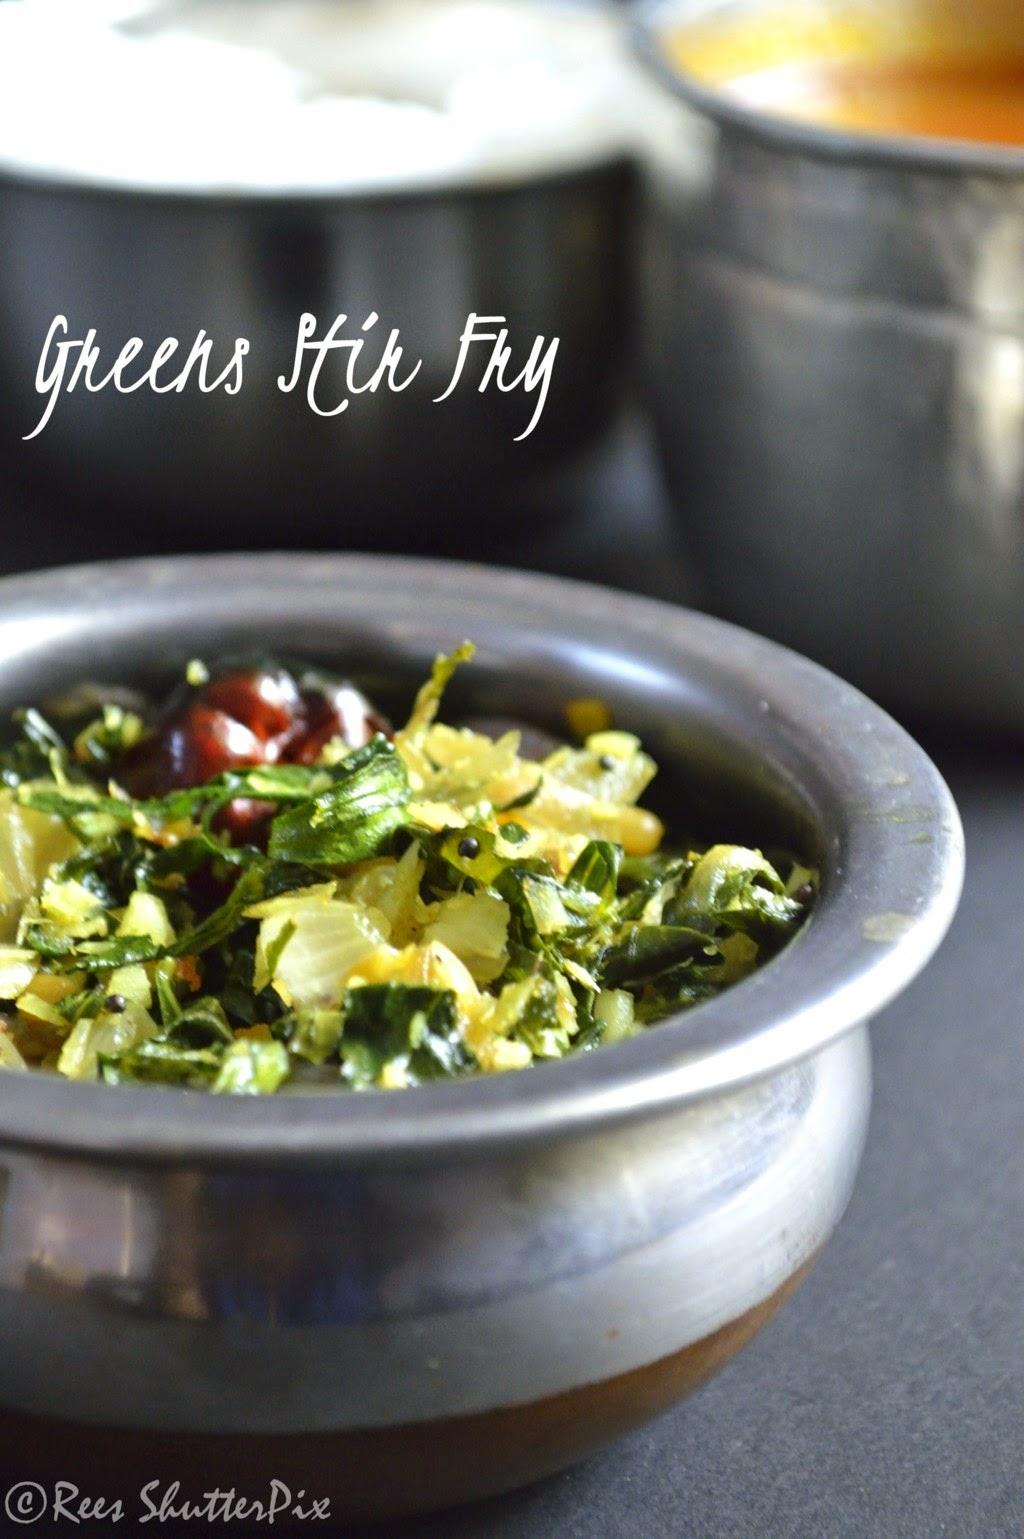 keerai, greens stir fry, side dish for rice, ponnagani keerai stir fry, grrens recipes, greens stir fry, keerai poriyal, keerai recipes, ponnagani keerai recipes, easy keerai recipes, keerai stir fry